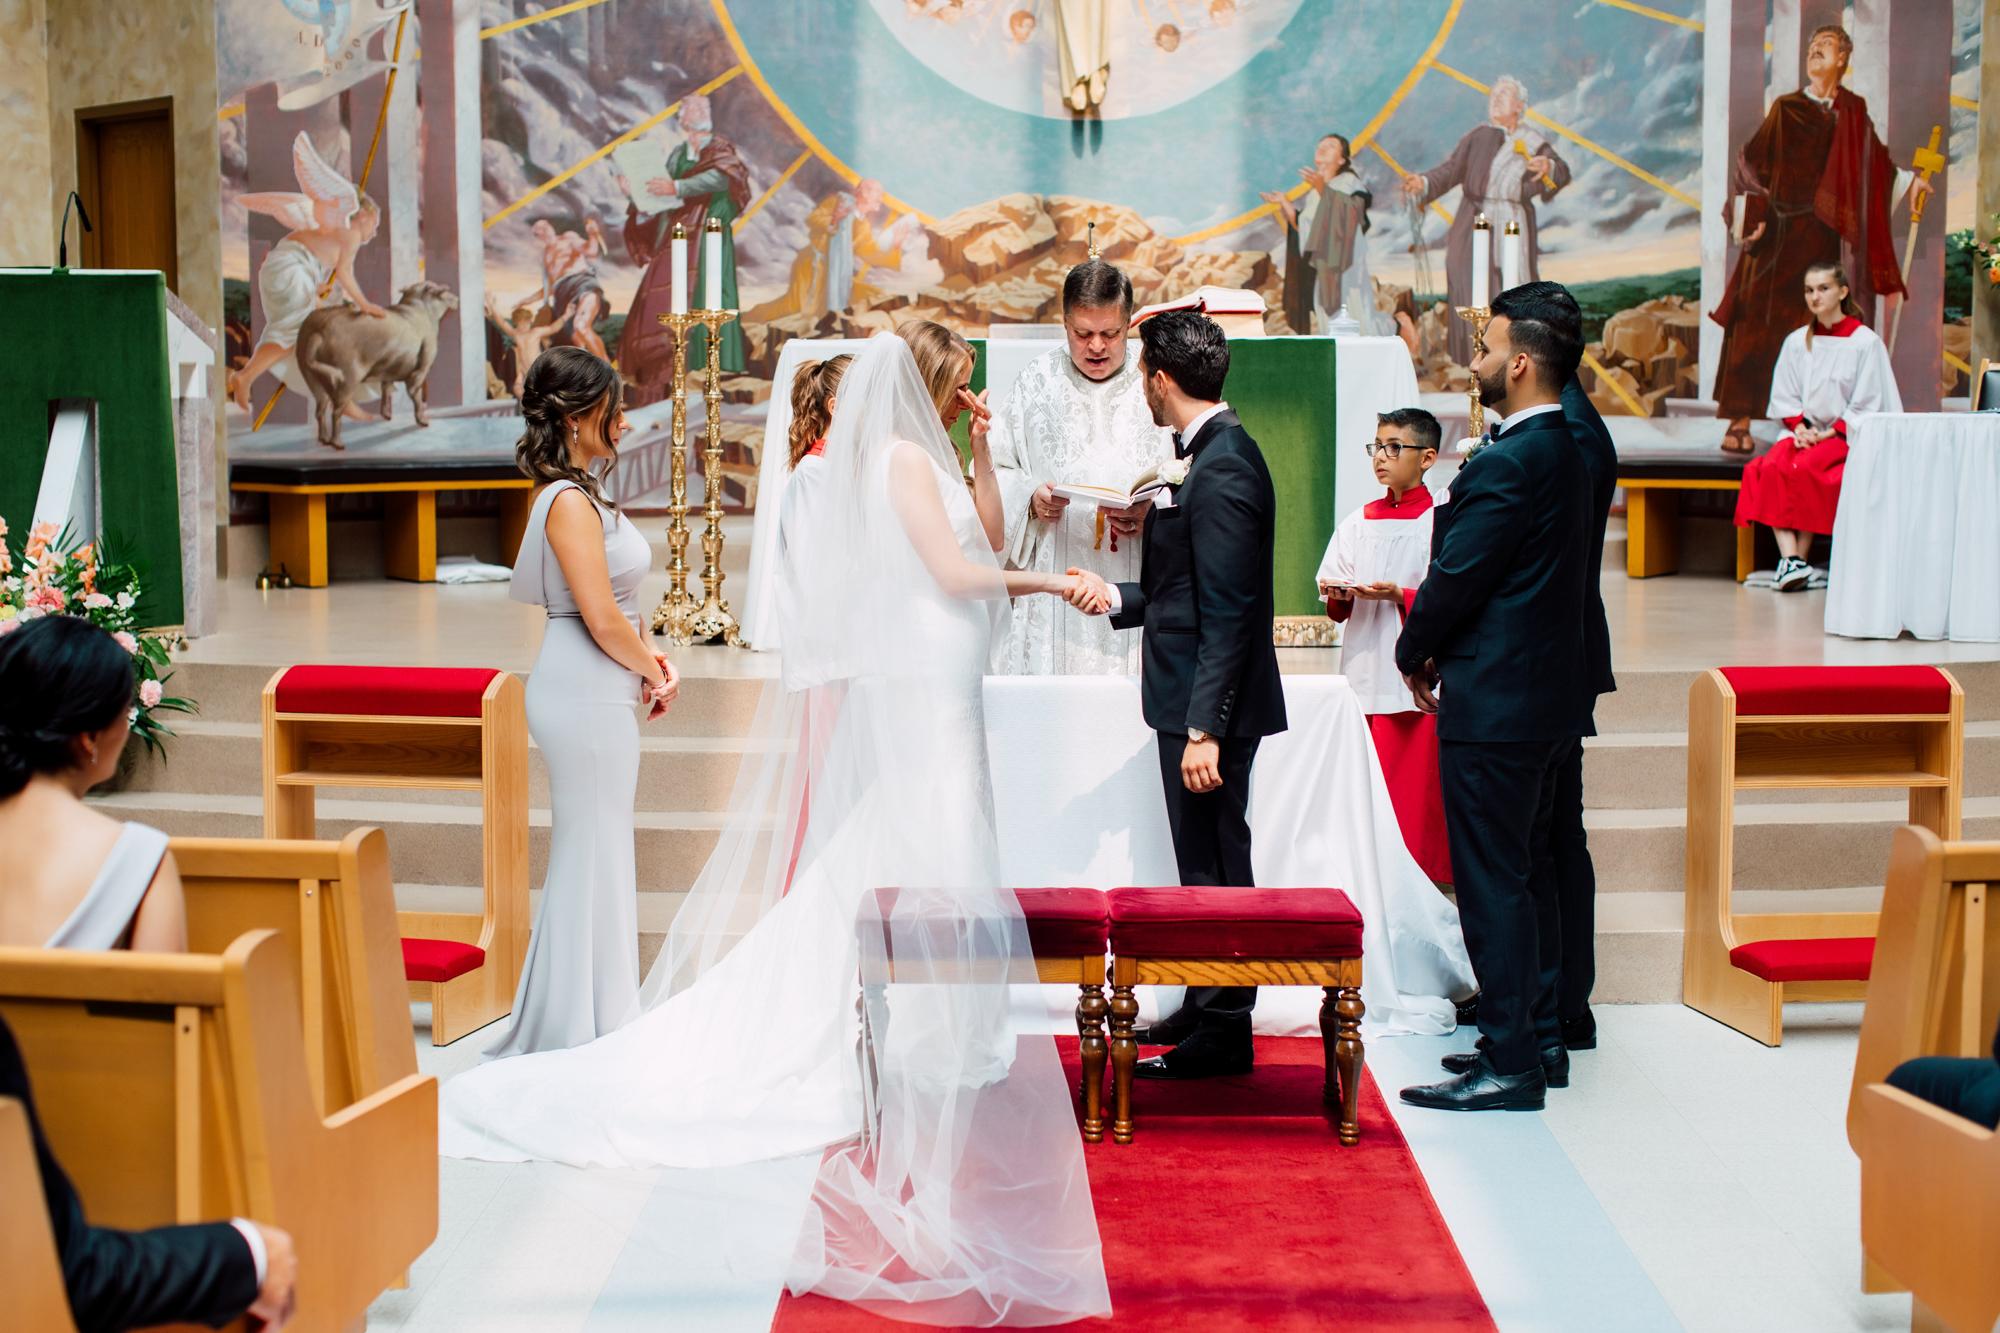 st. david's parish wedding ceremony